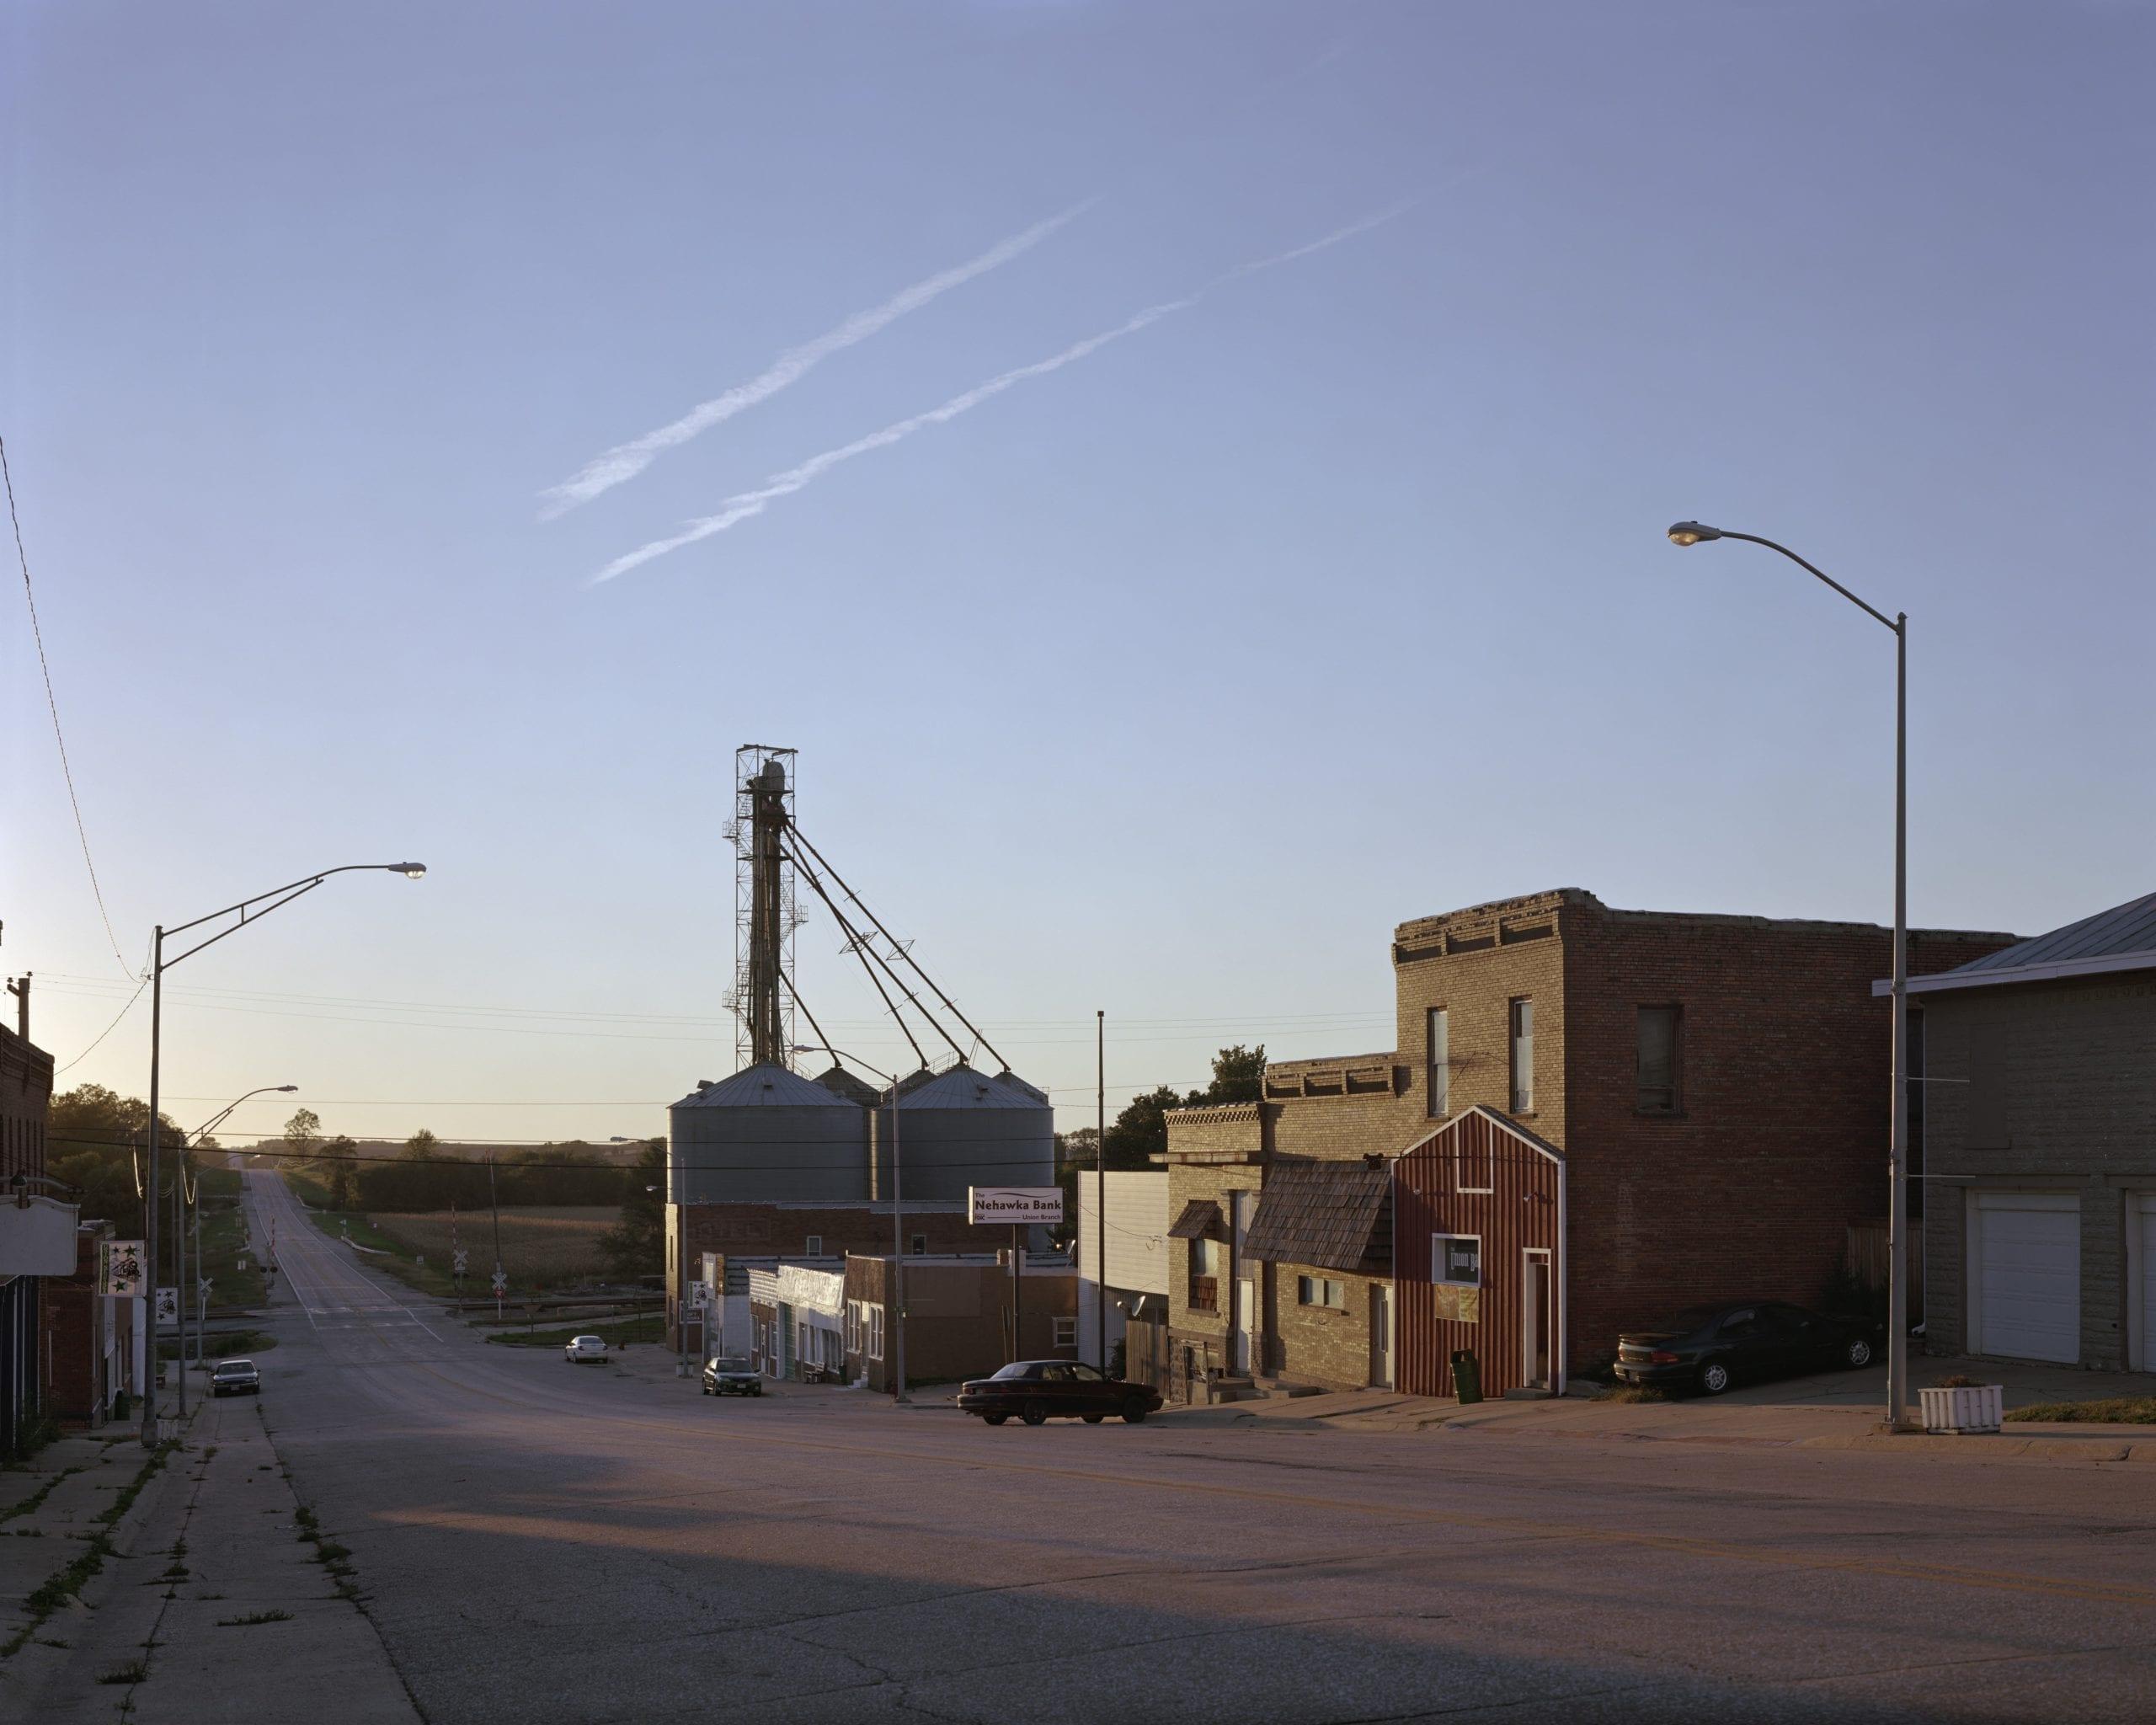 Union, Nebraska, 2013